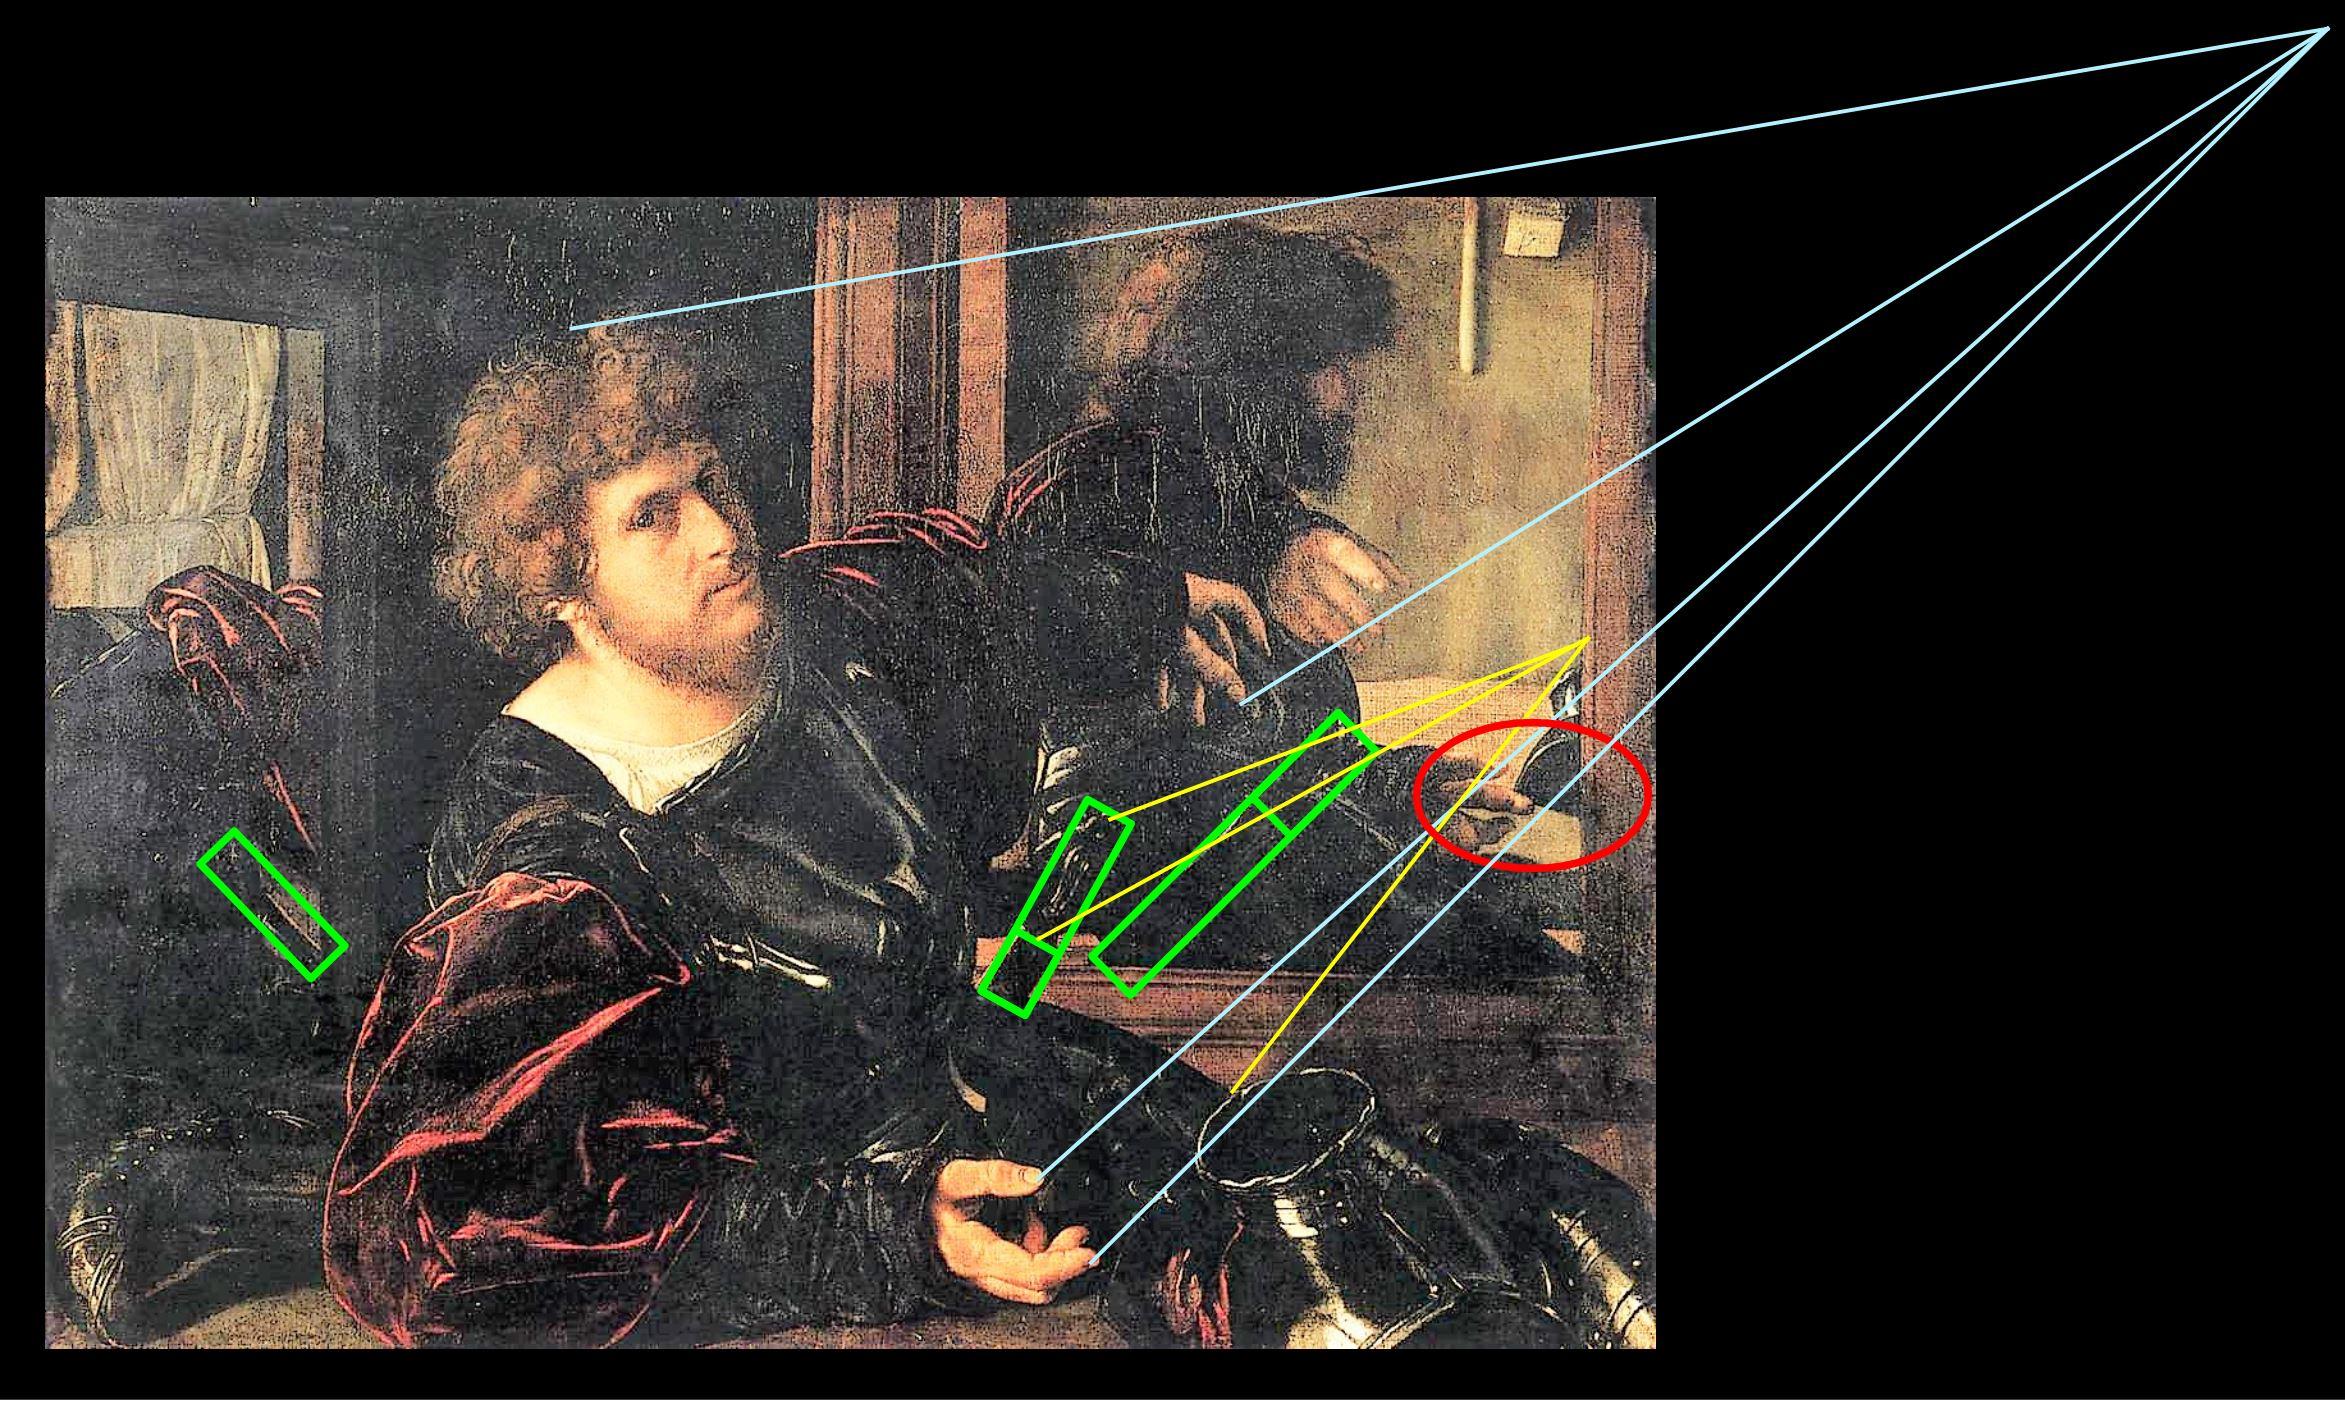 Giovanni_Gerolamo_Savoldo_Autoportrait Vers 1525 Louvre perspective